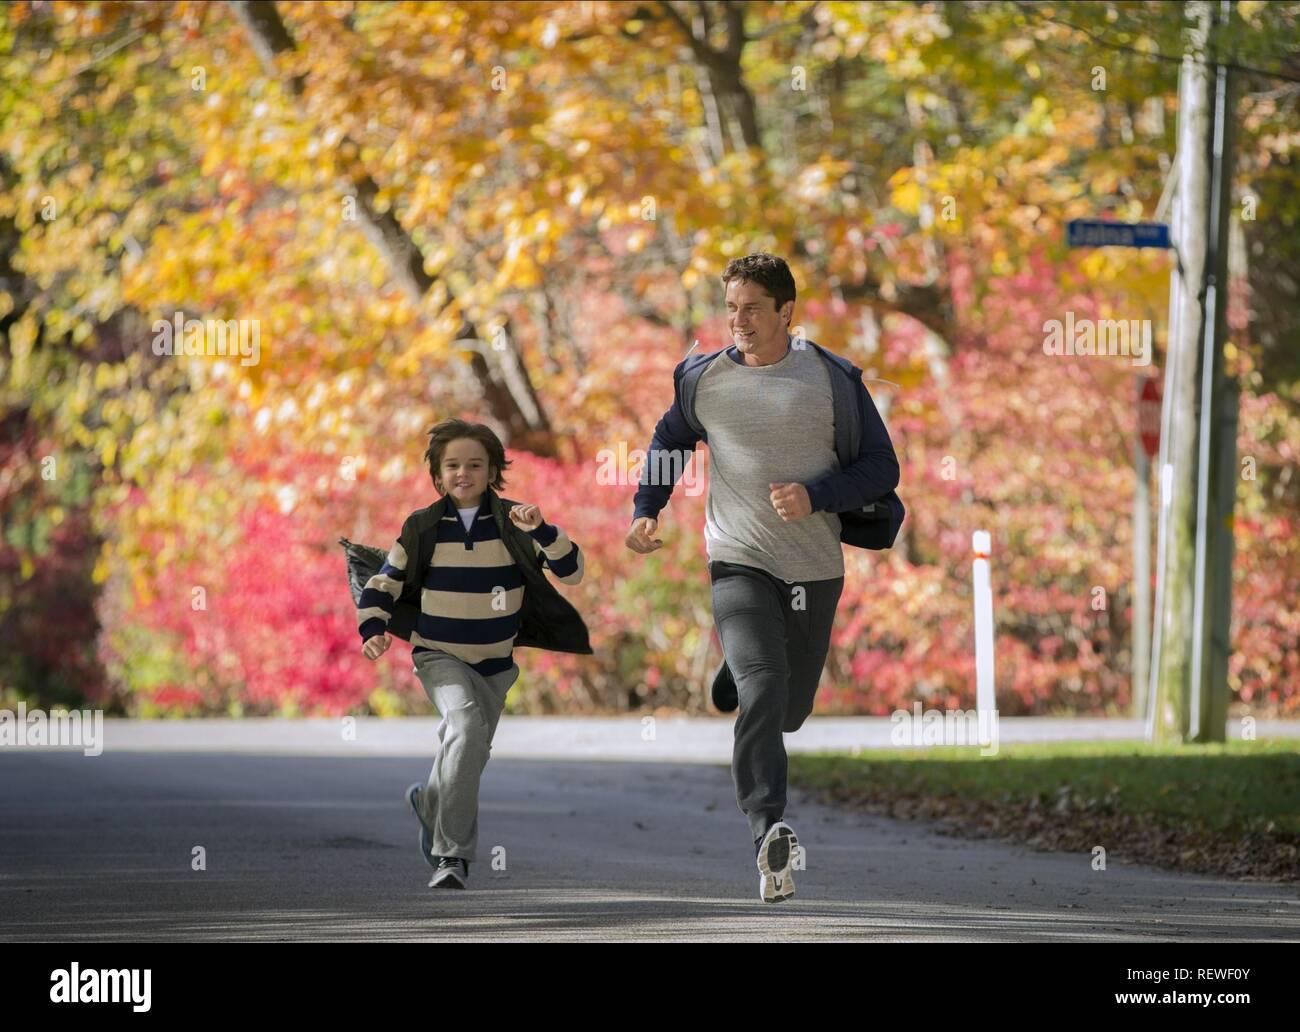 SAMUEL FARACI & GERARD BUTLER A FAMILY MAN (2016) - Stock Image